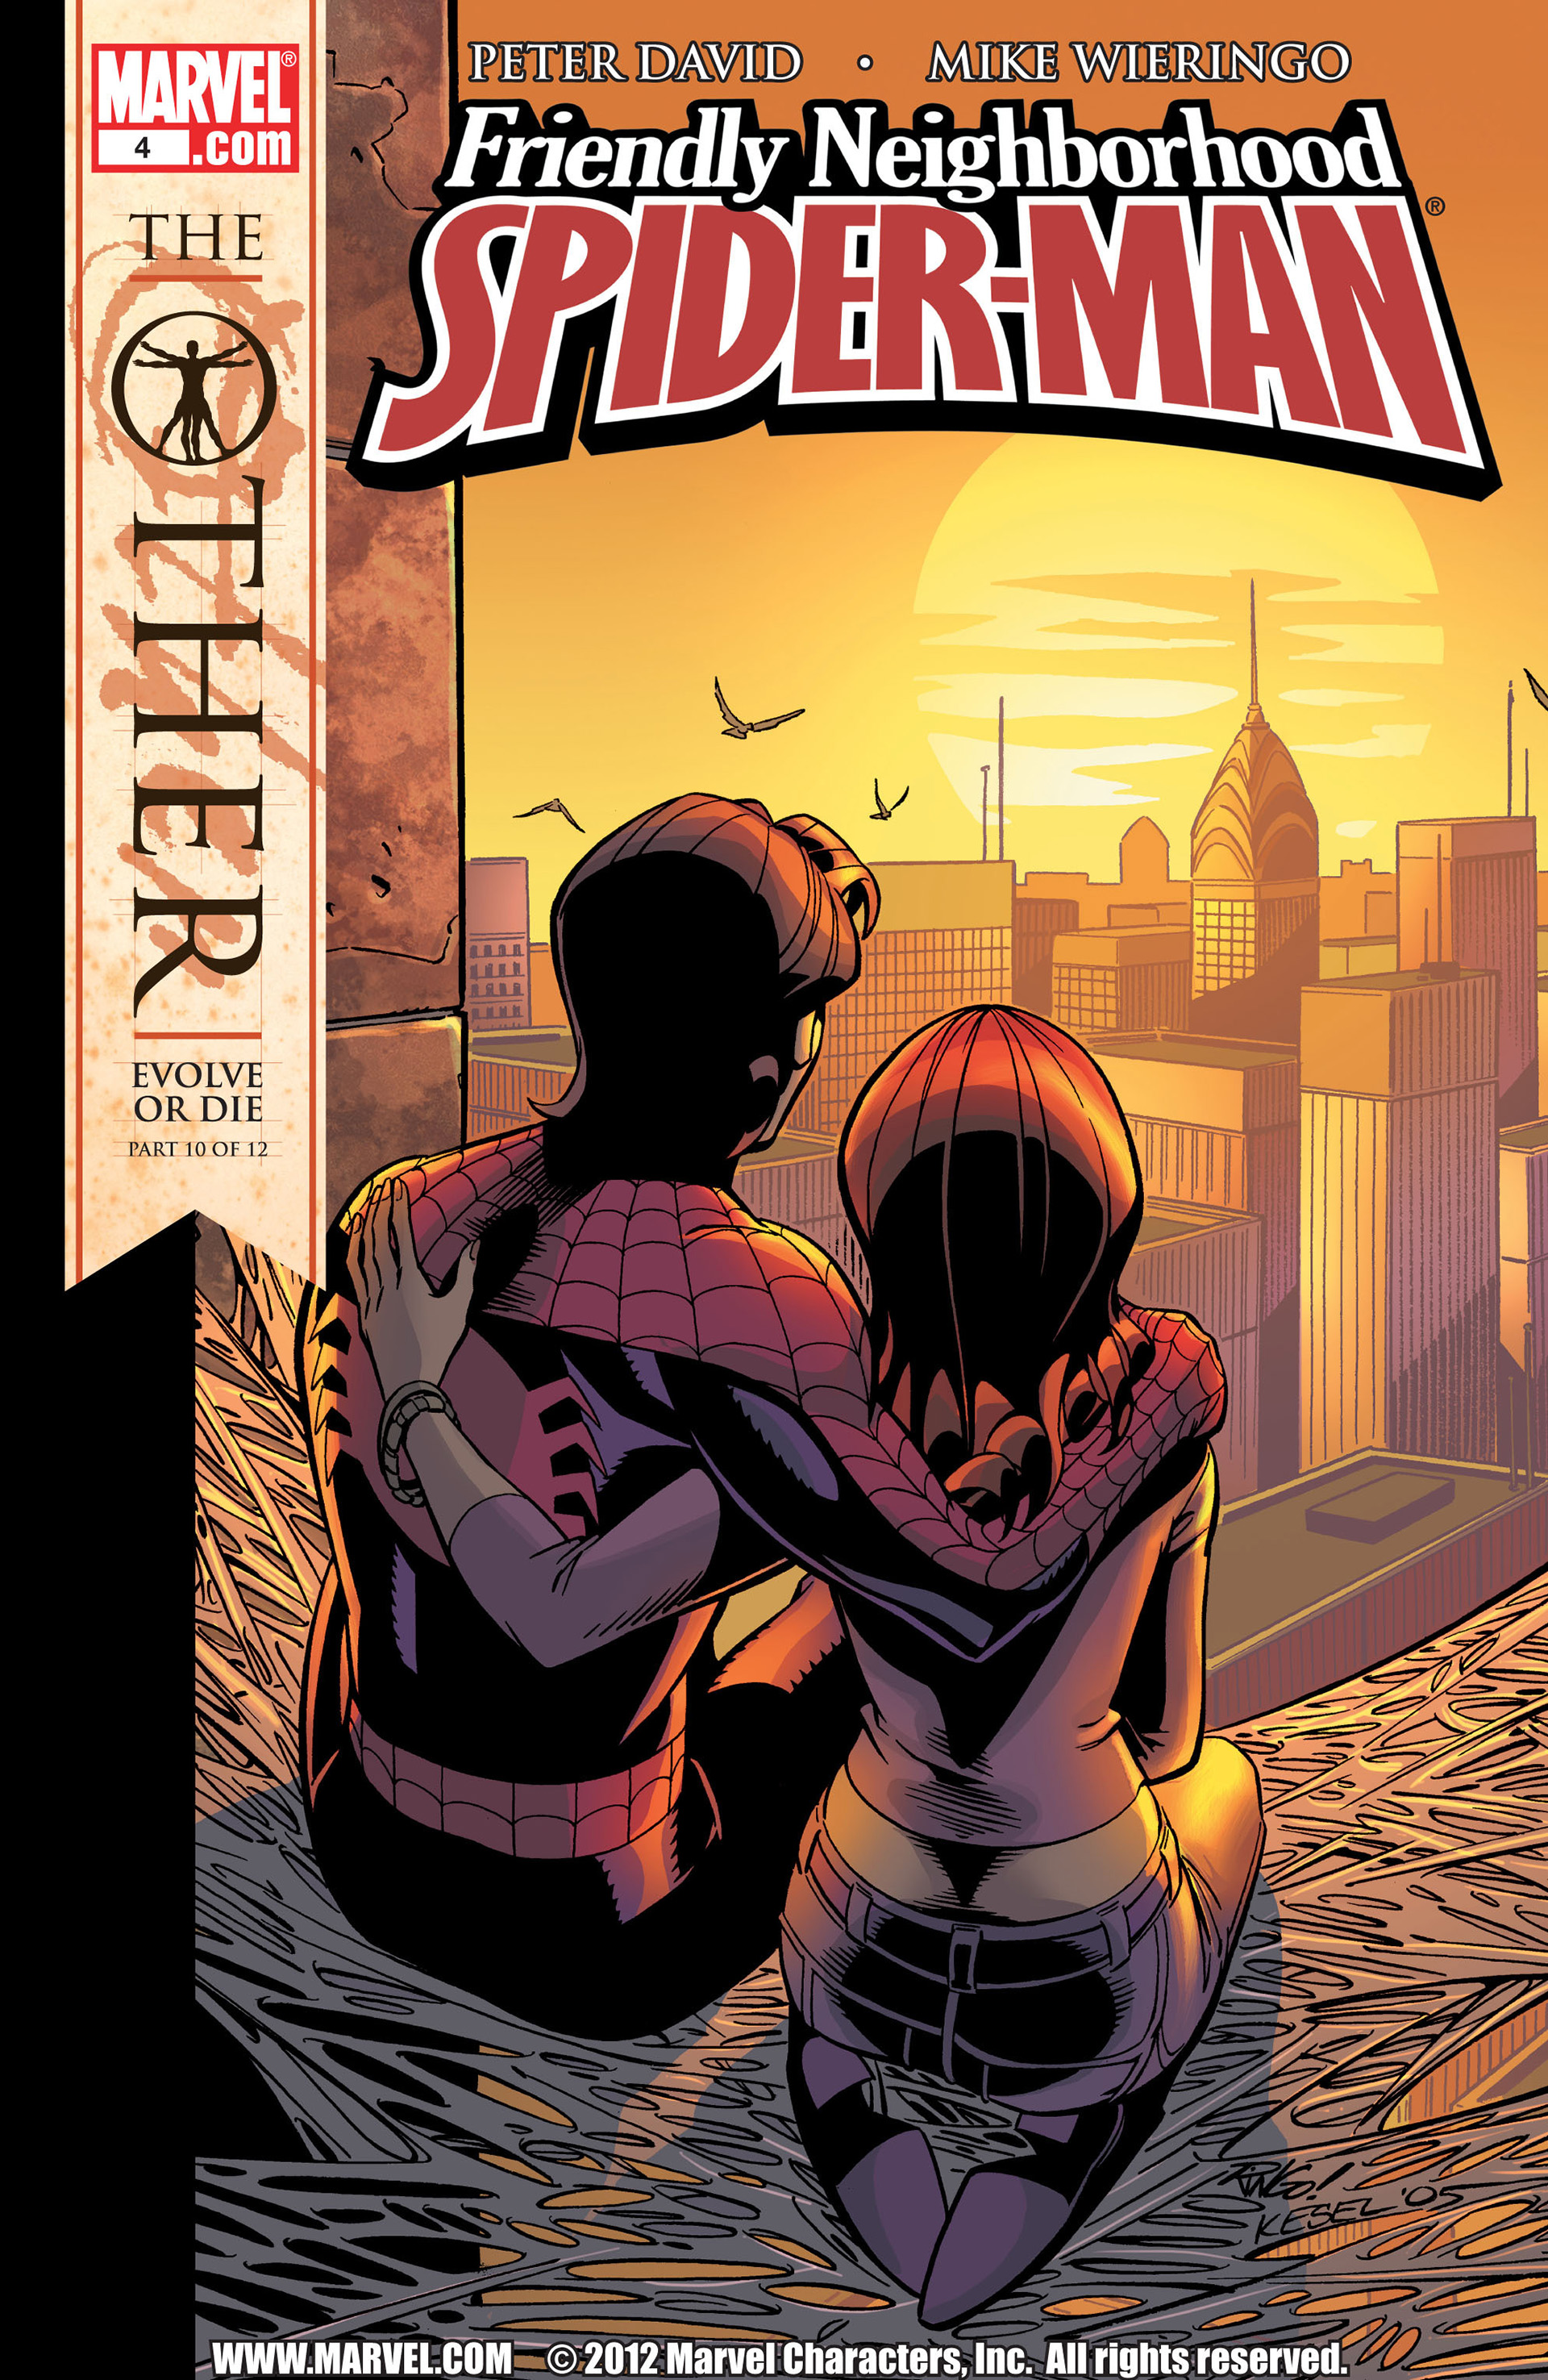 Friendly Neighborhood Spider-Man 4 Page 1